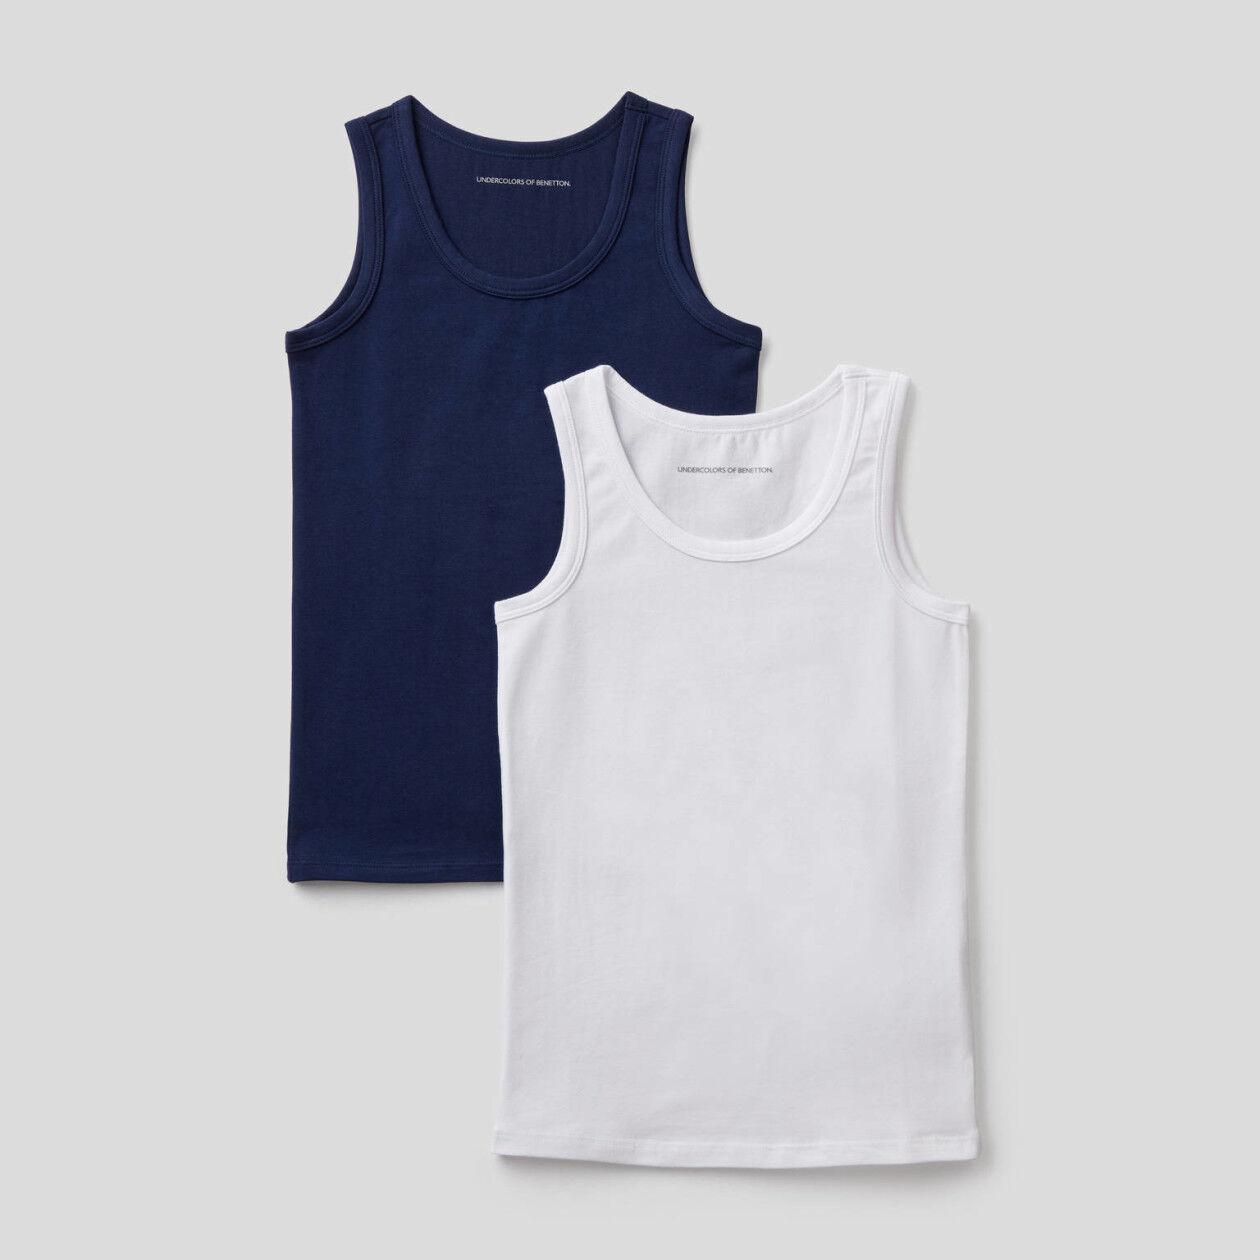 Dos camisetas de tirantes de algodón elástico